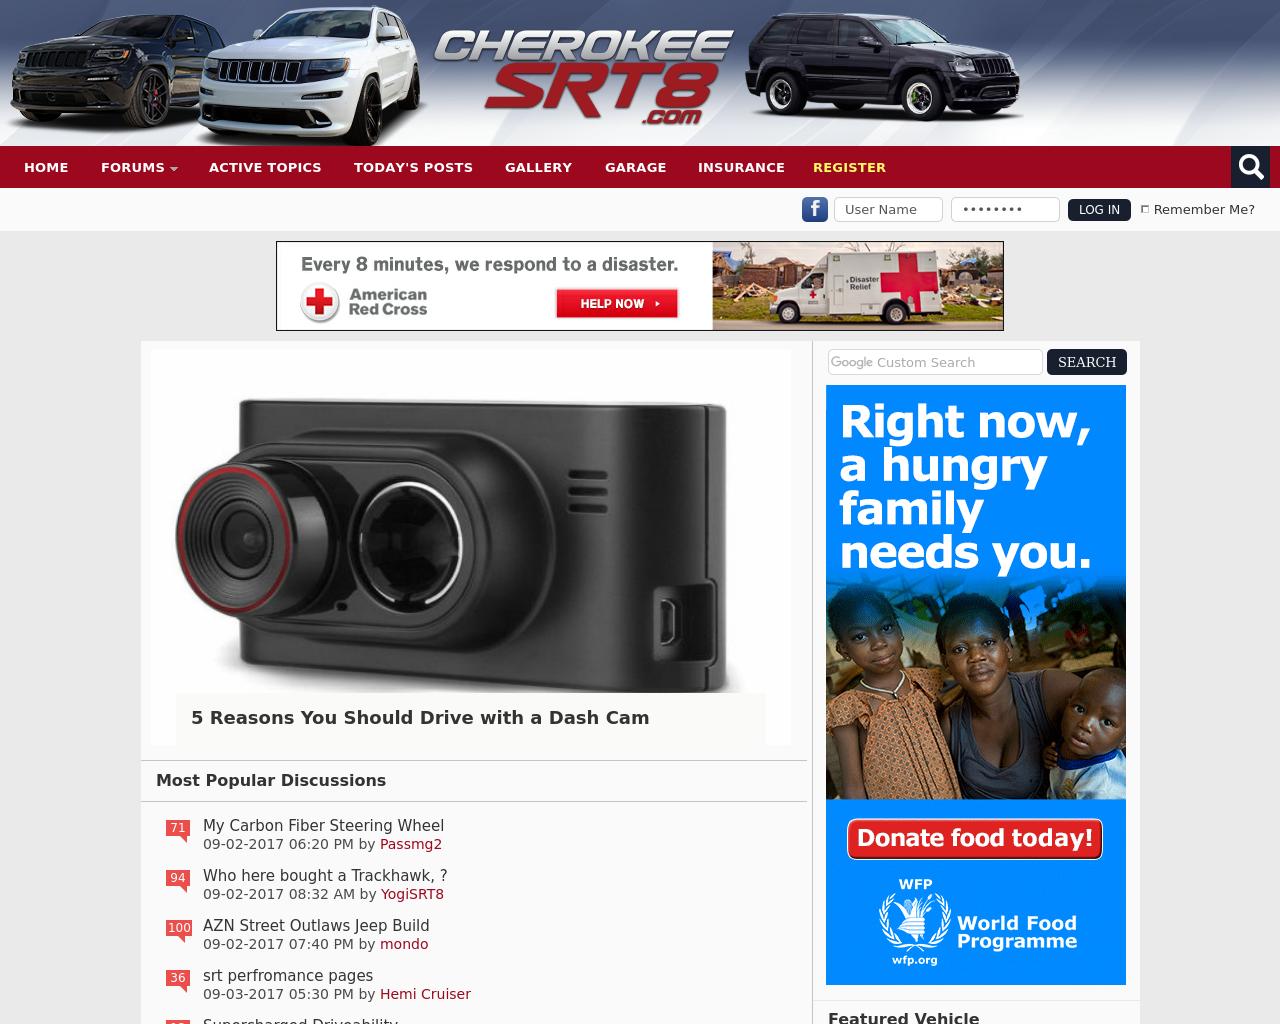 Cherokee-SRT8-Advertising-Reviews-Pricing